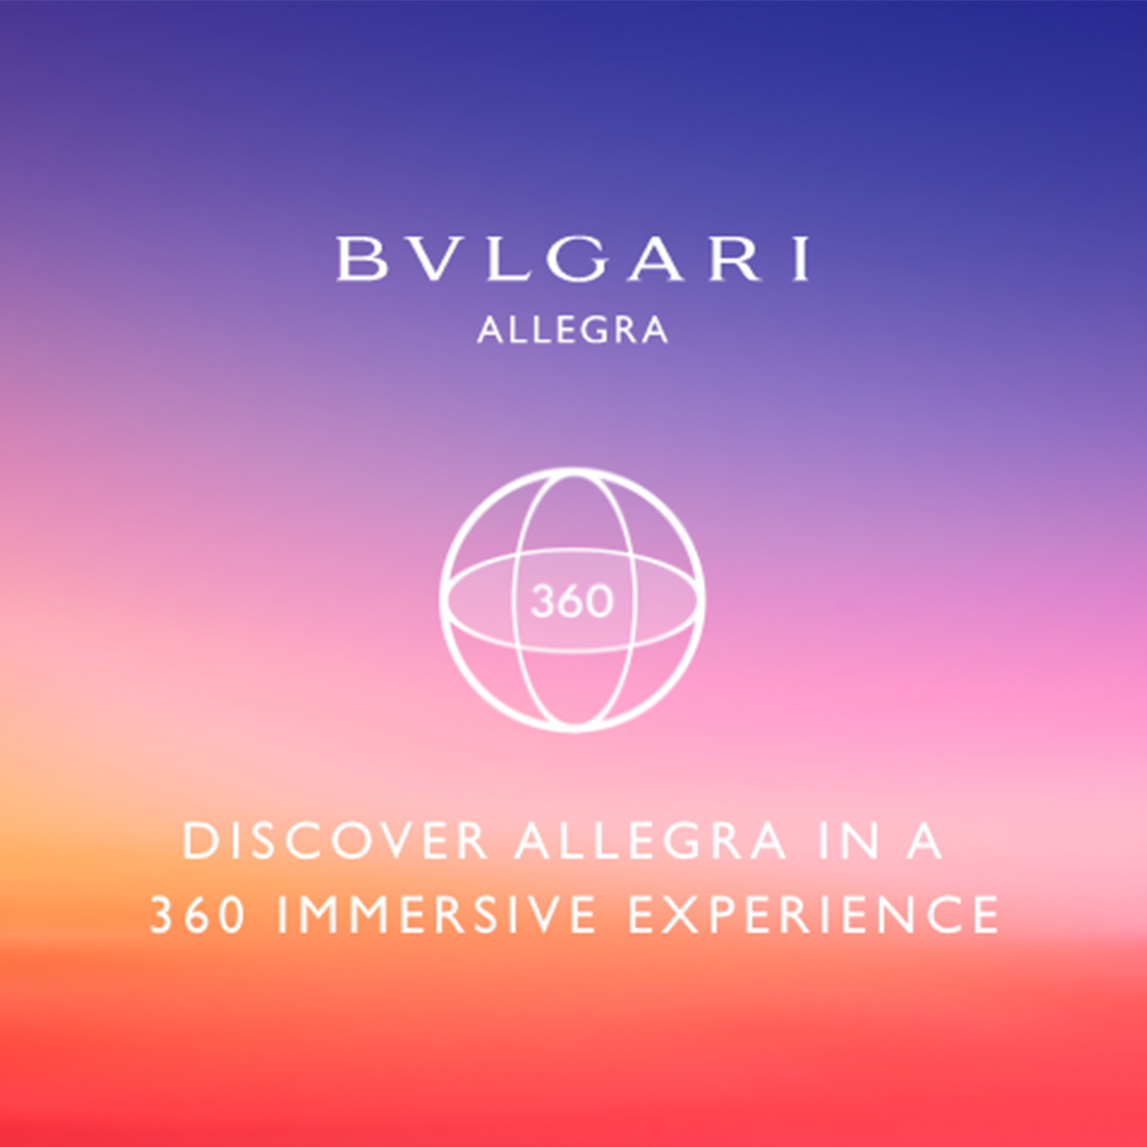 BVLGARI Allegra Content Visual 4